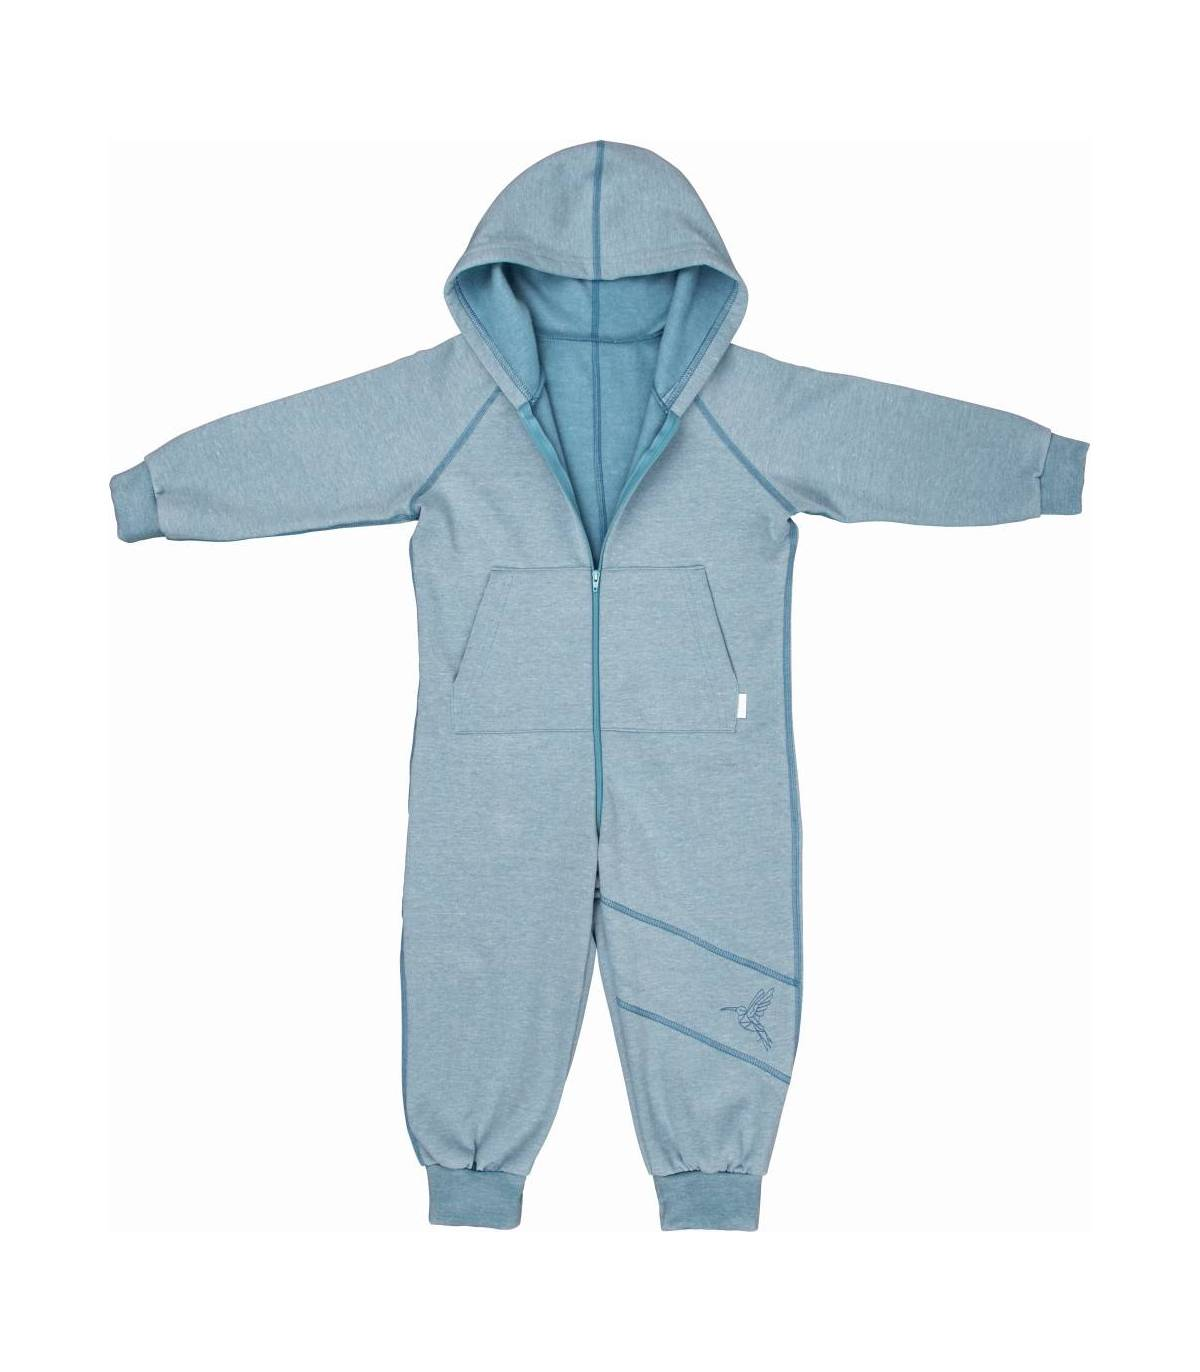 Zewi Bébé-Jou Onesie Anzug Blau